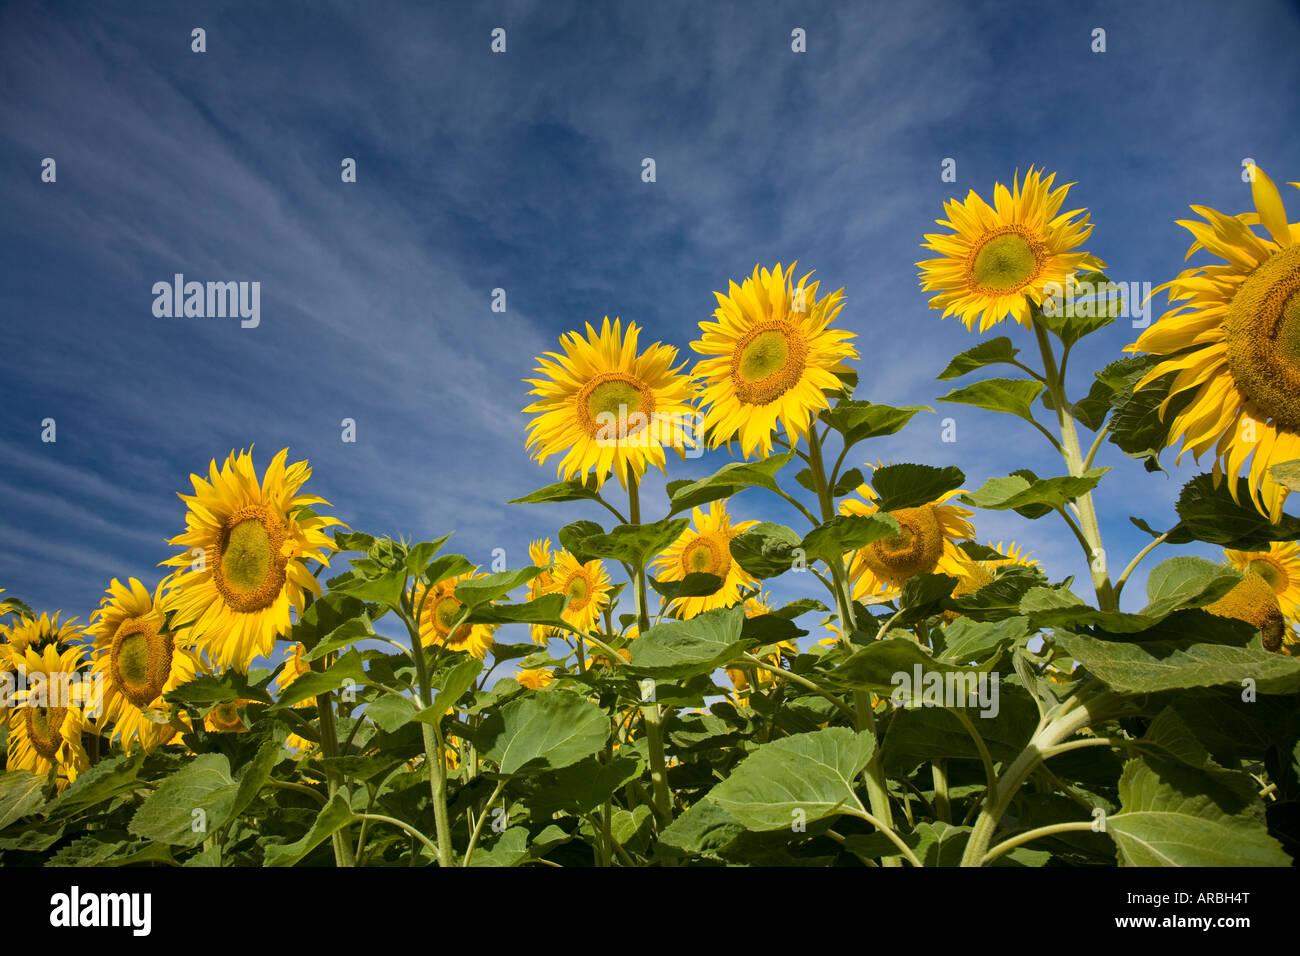 Pristine sunflowers greeting the morning sun, Oamaru, New Zealand - Stock Image